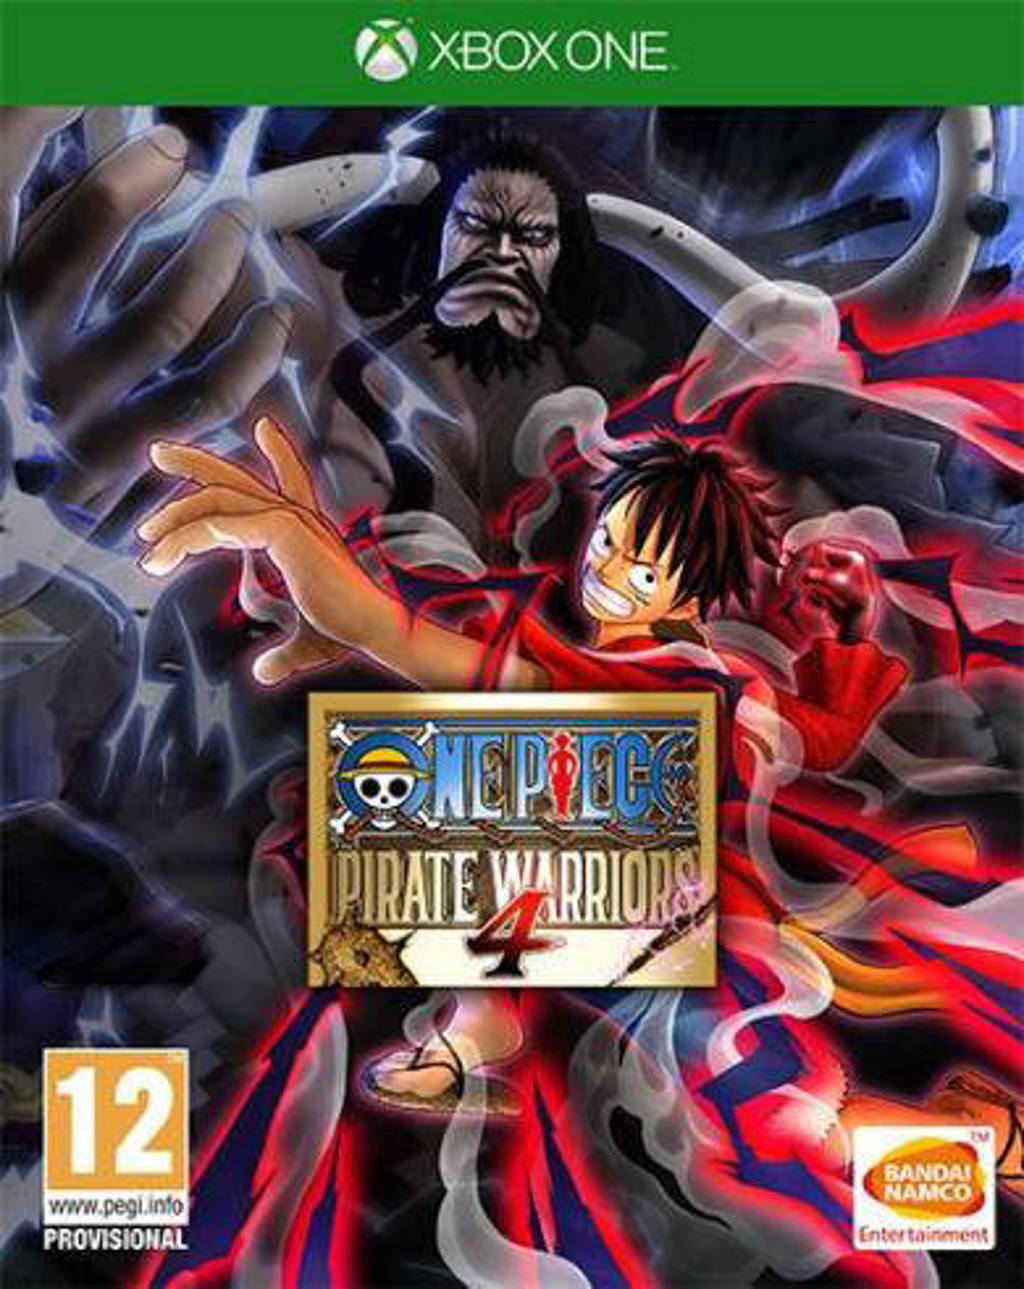 One piece - Pirate warriors 4 (Xbox One)